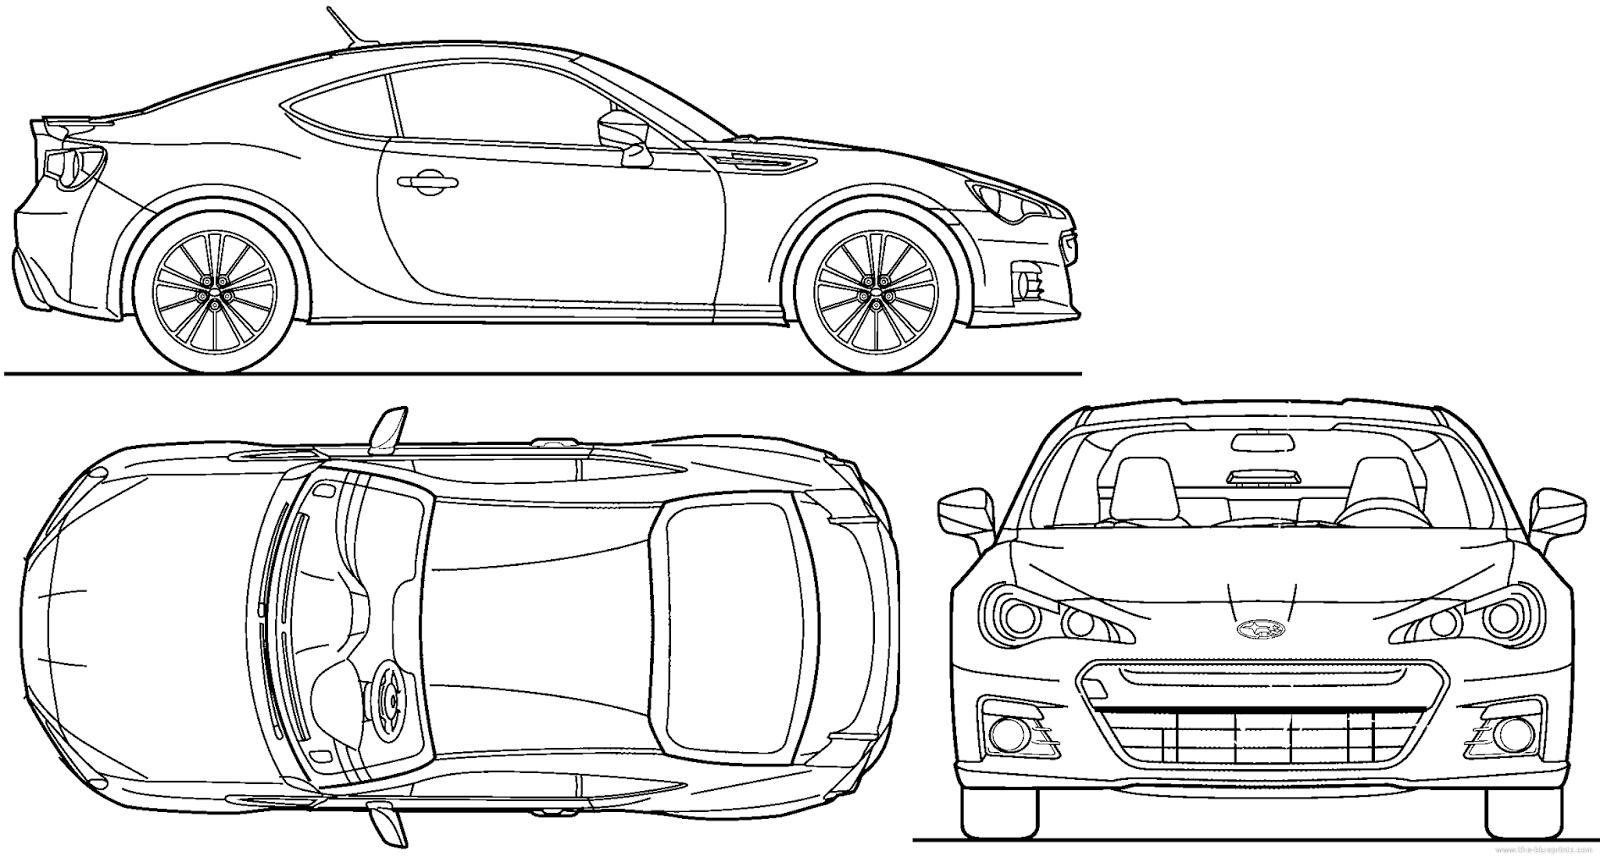 Cgfrog Most Loved Car Blueprints For 3d Modeling